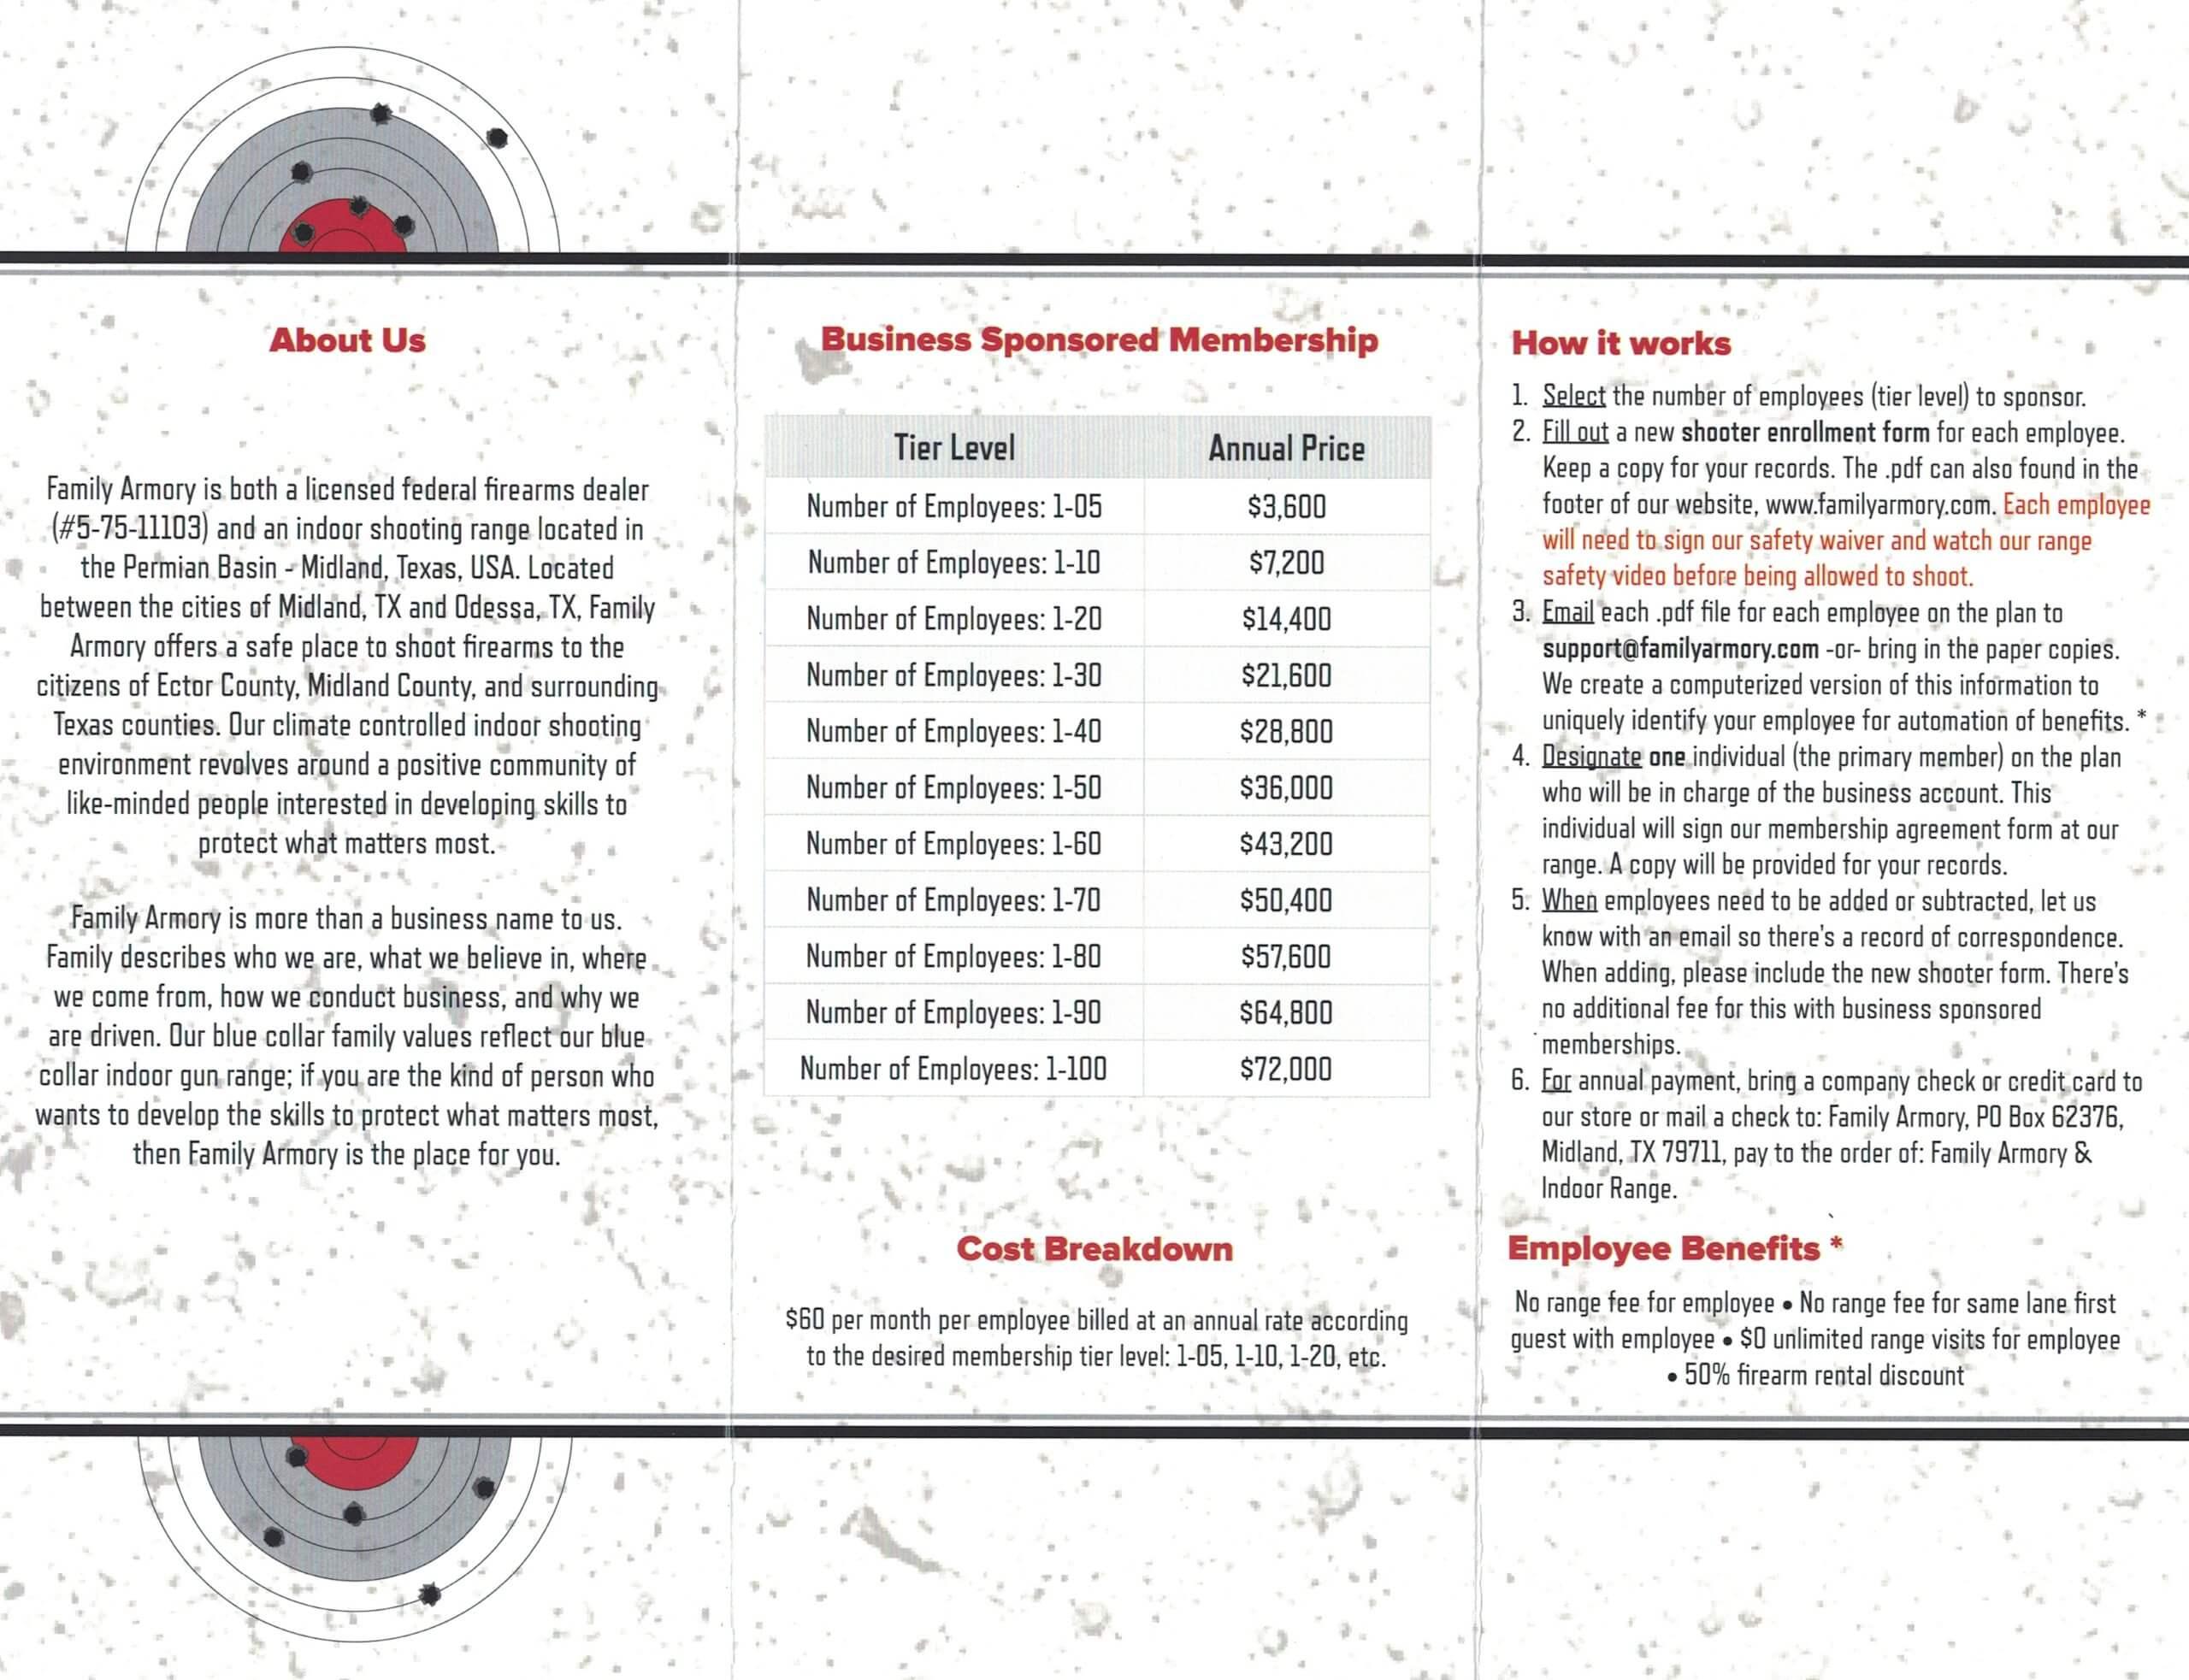 Family Armory Corporate Membership Brochure Interior